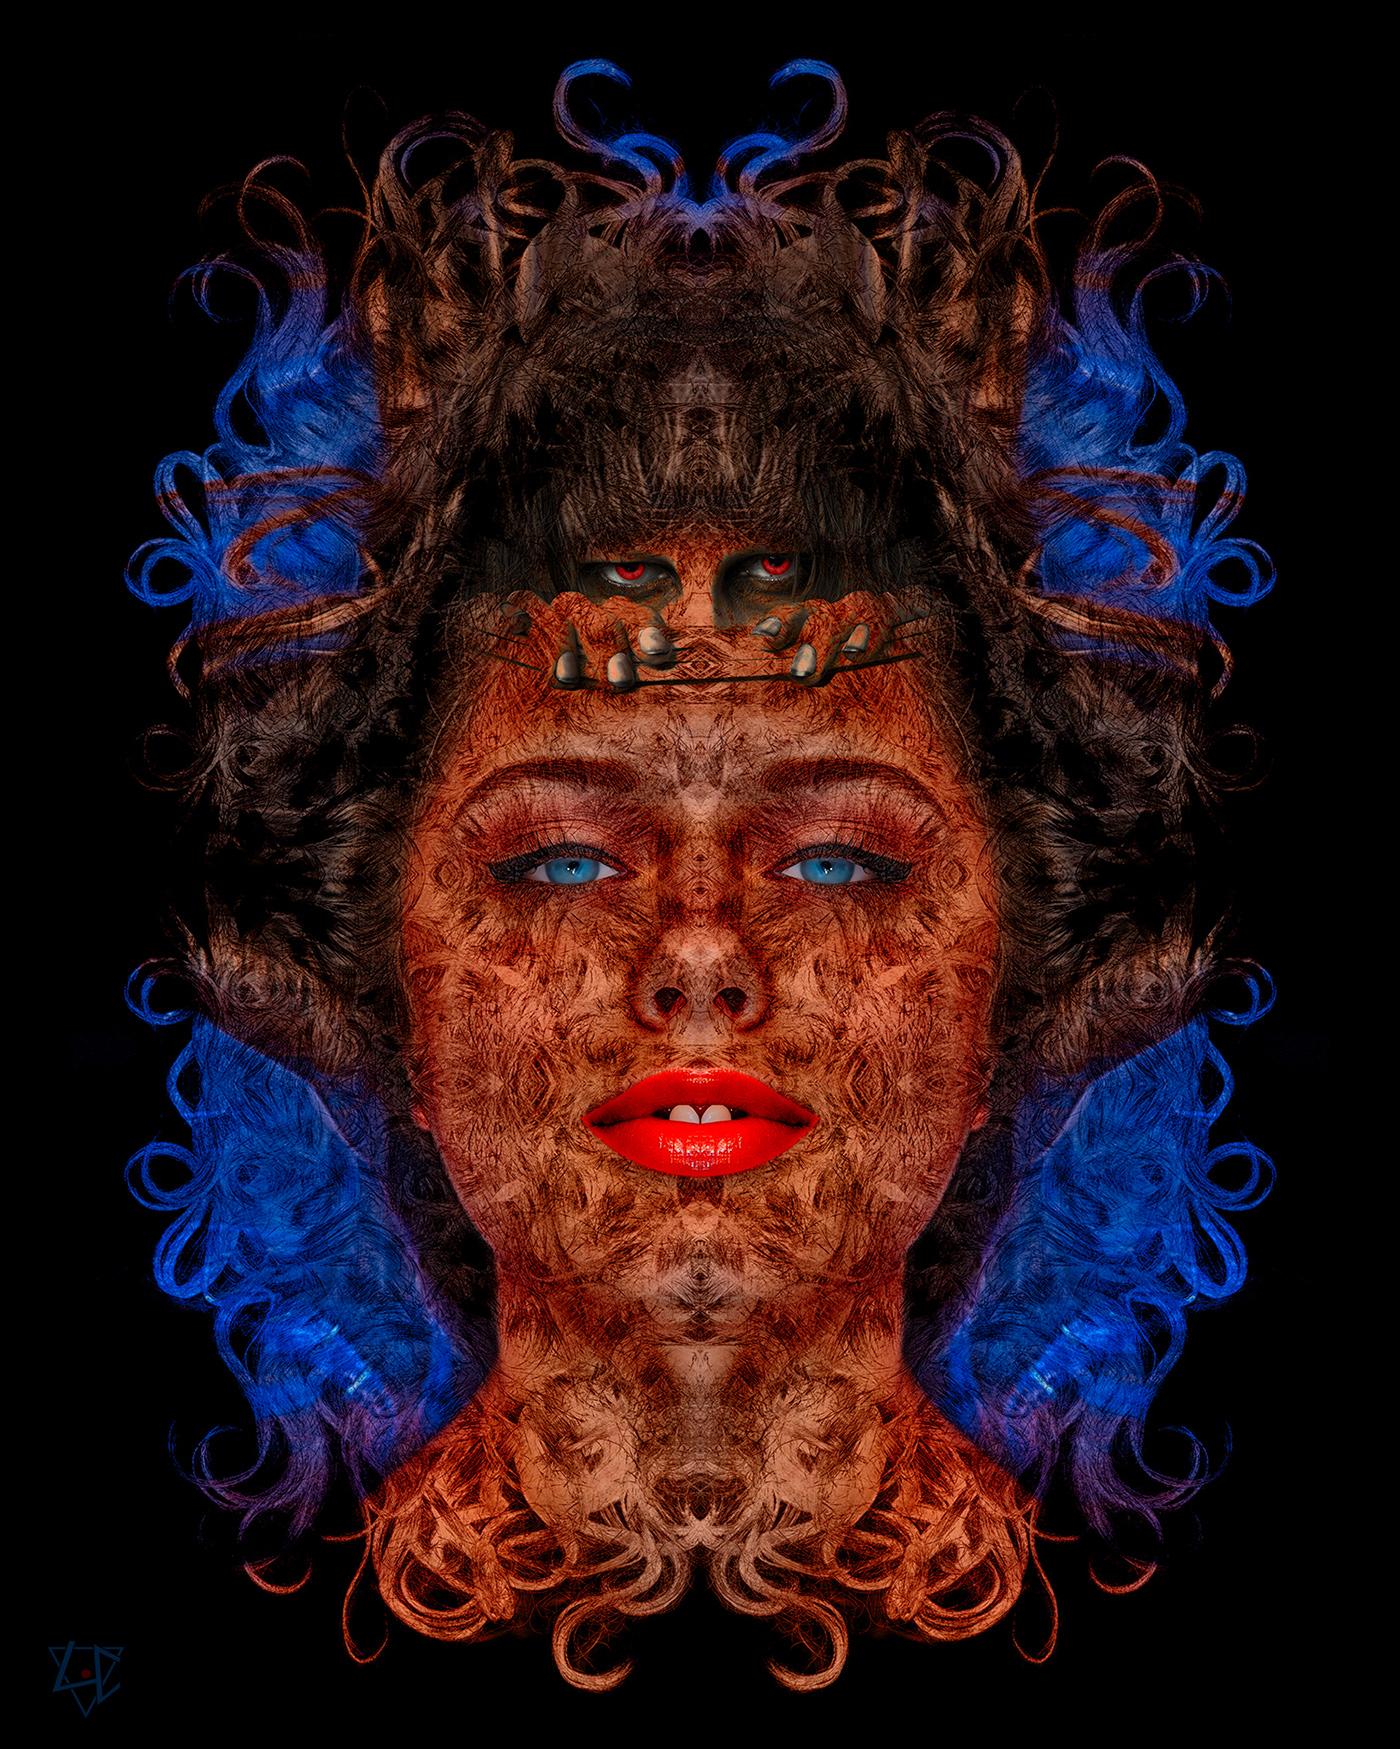 digitalart digitalcollage graphism photomontage